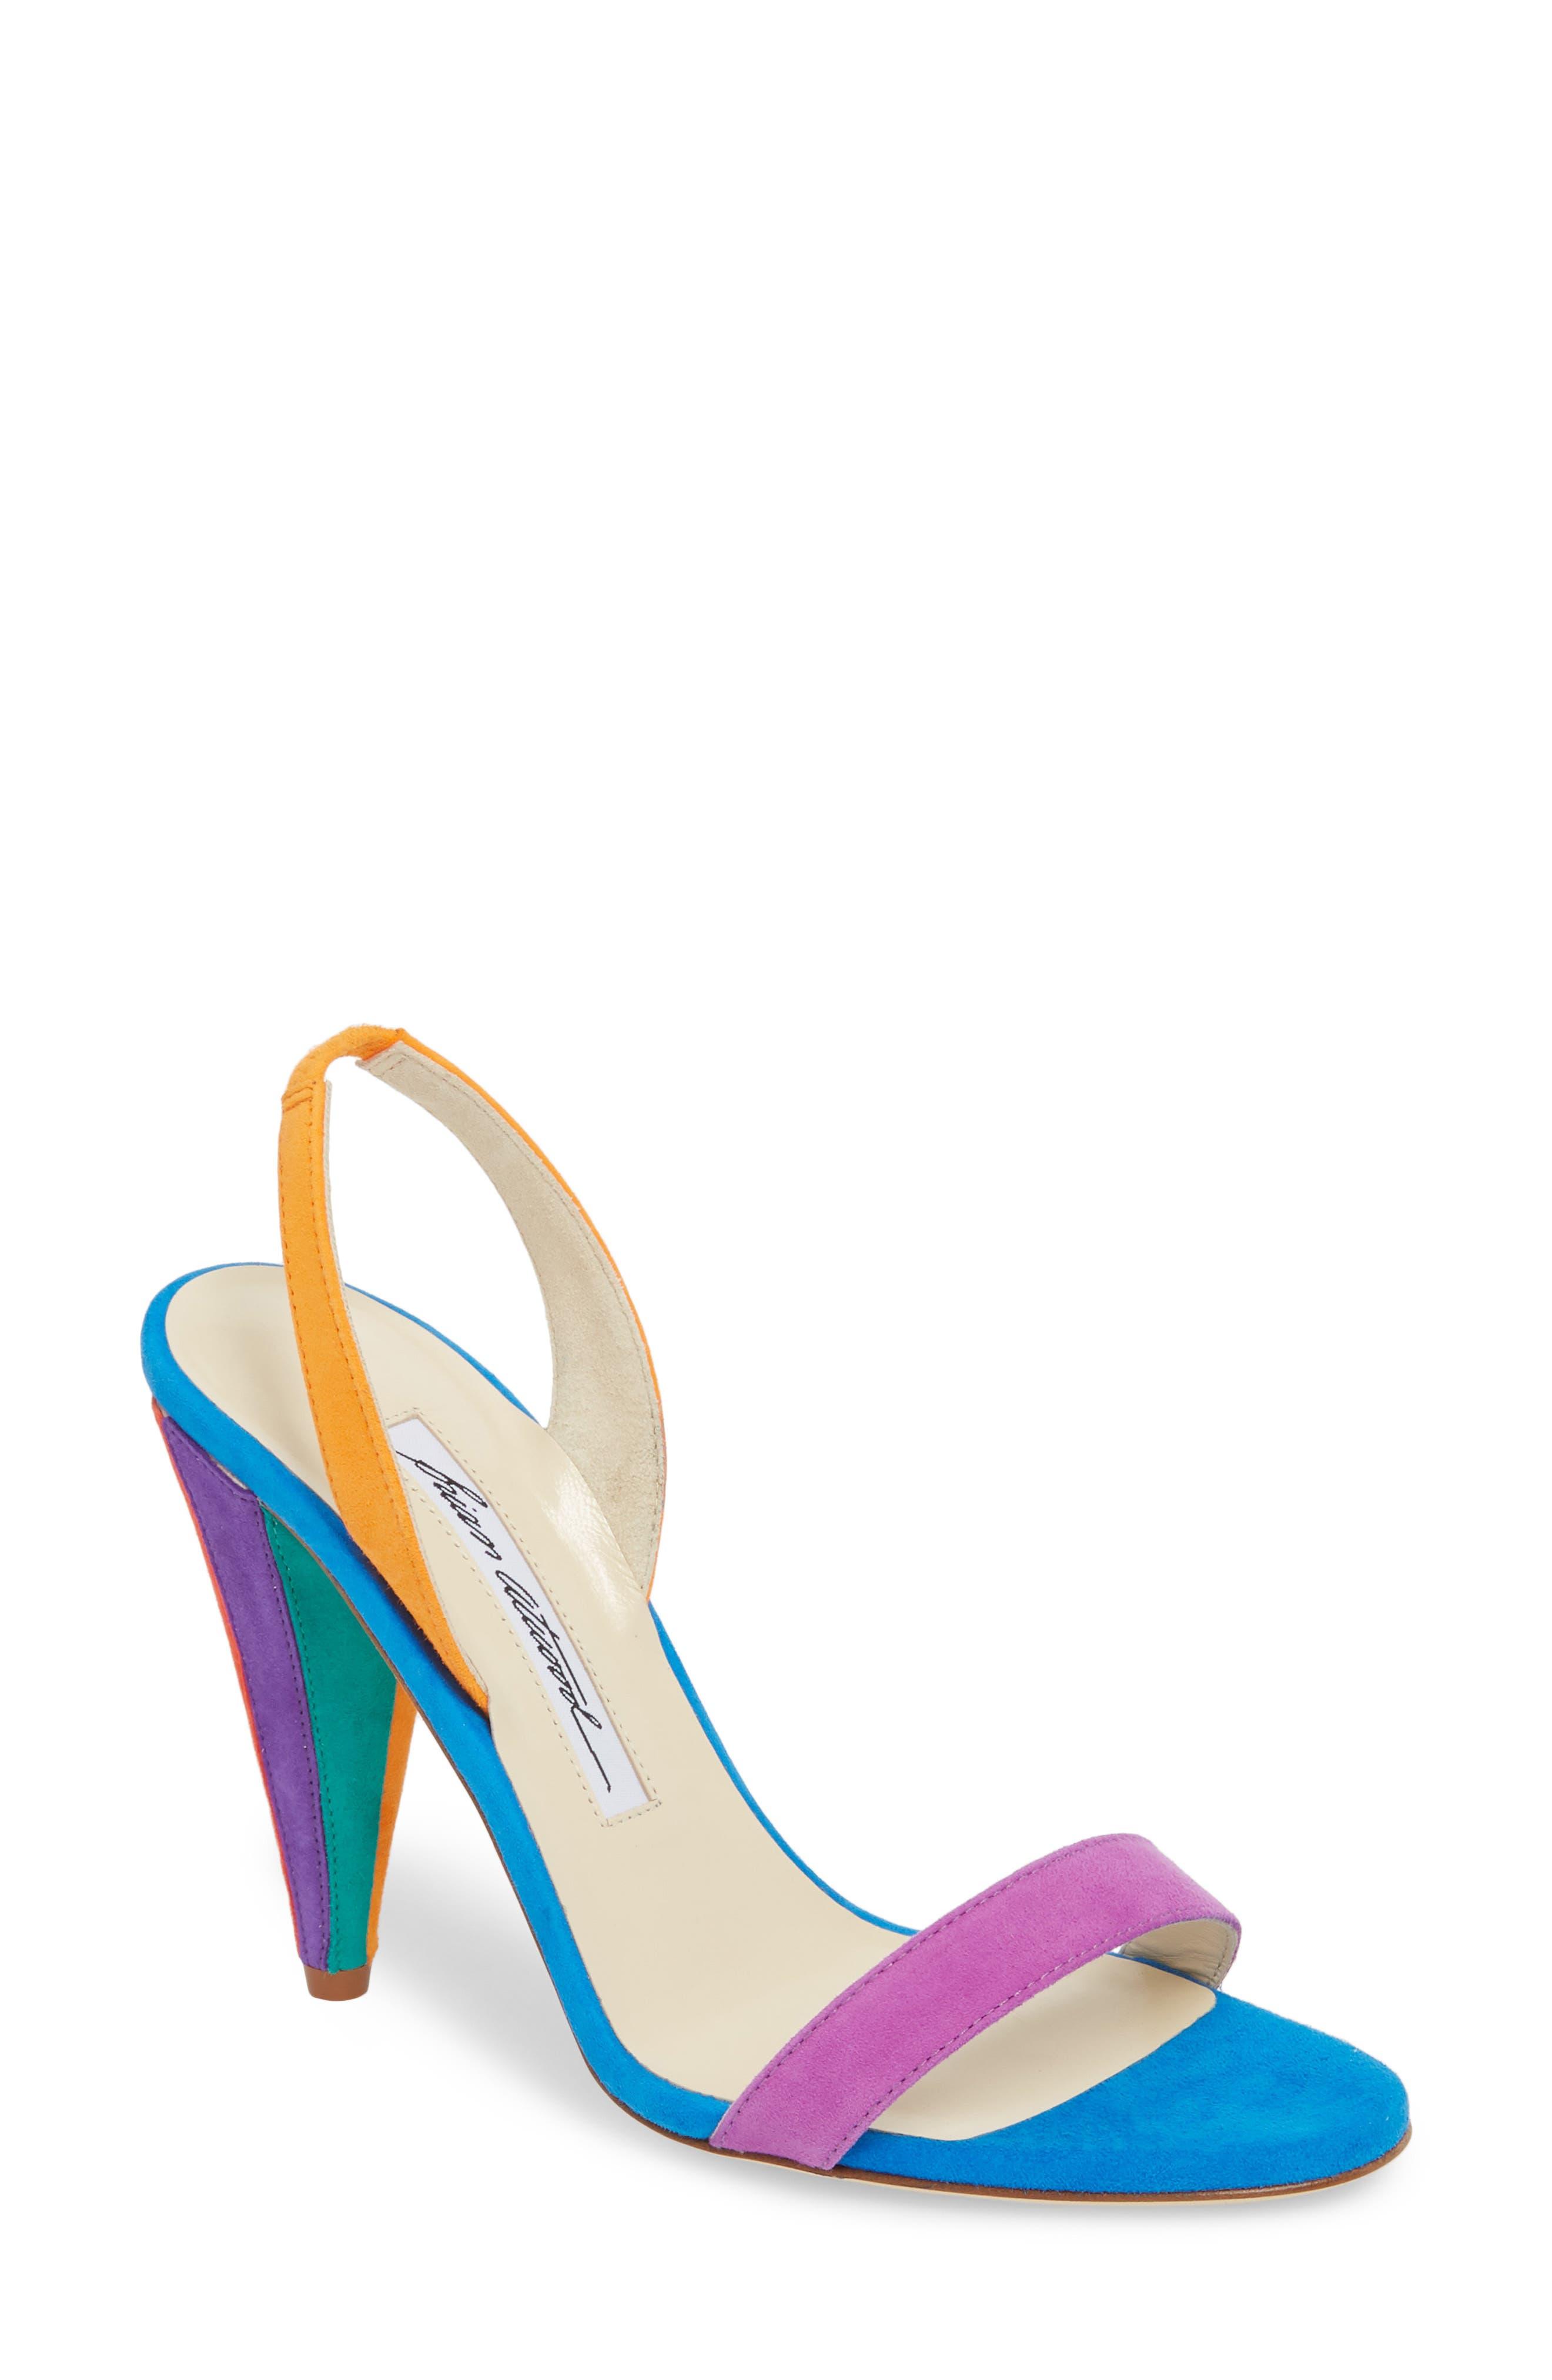 Susii Cone Heel Sandal,                         Main,                         color, Multi Color